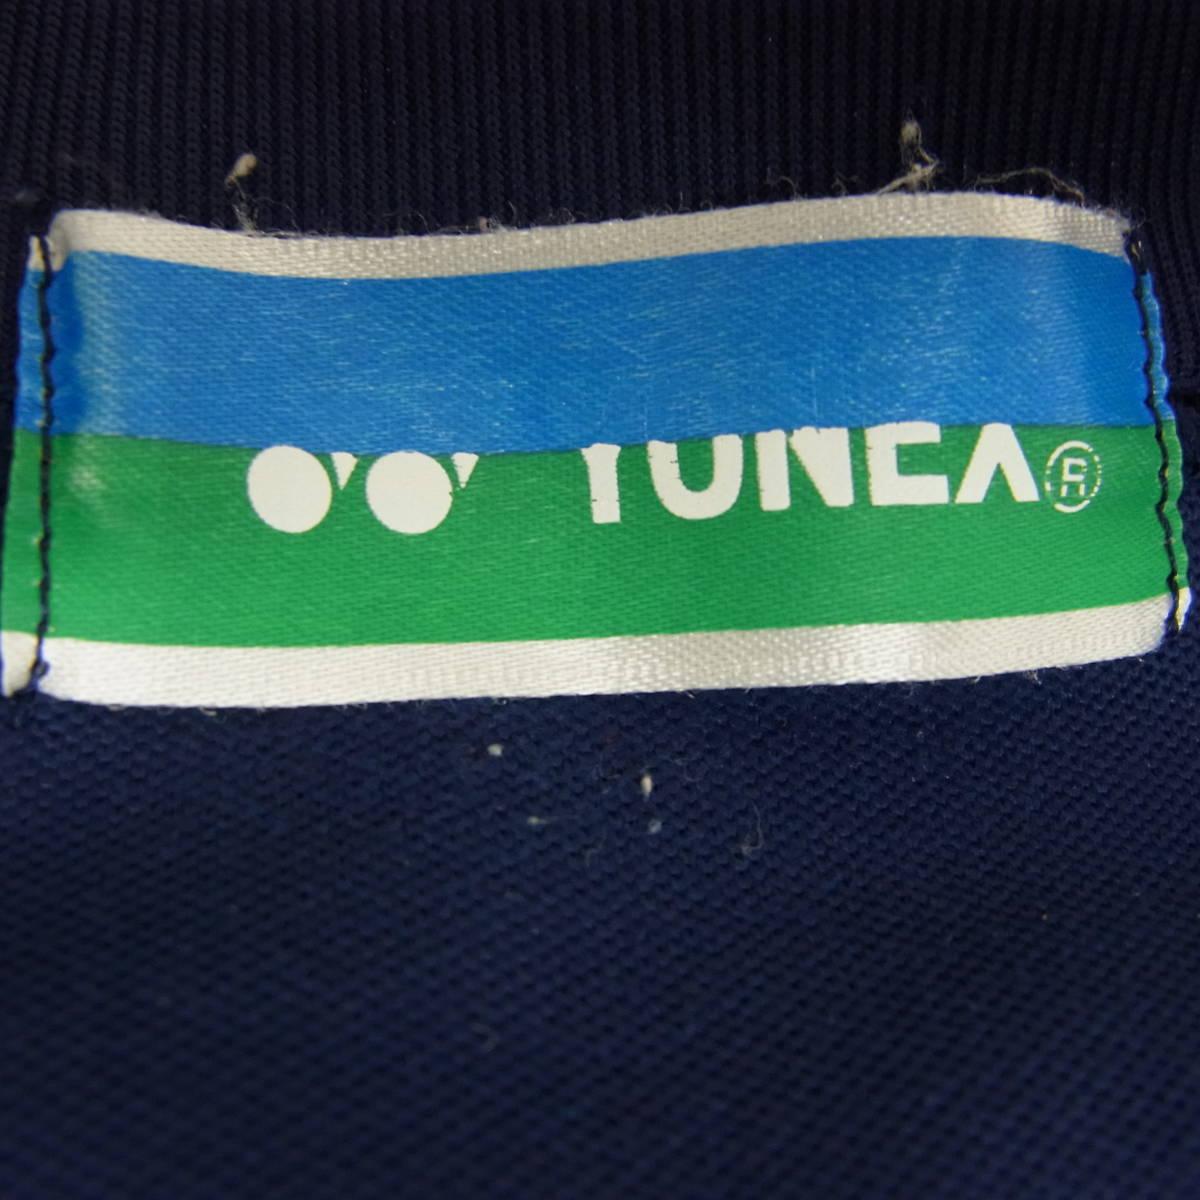 YONEX ヨネックス☆メンズ Tシャツ Mサイズ ☆吸汗速乾 メッシュ加工 日本製 ☆スポーツ トレーニング フィットネス_画像4